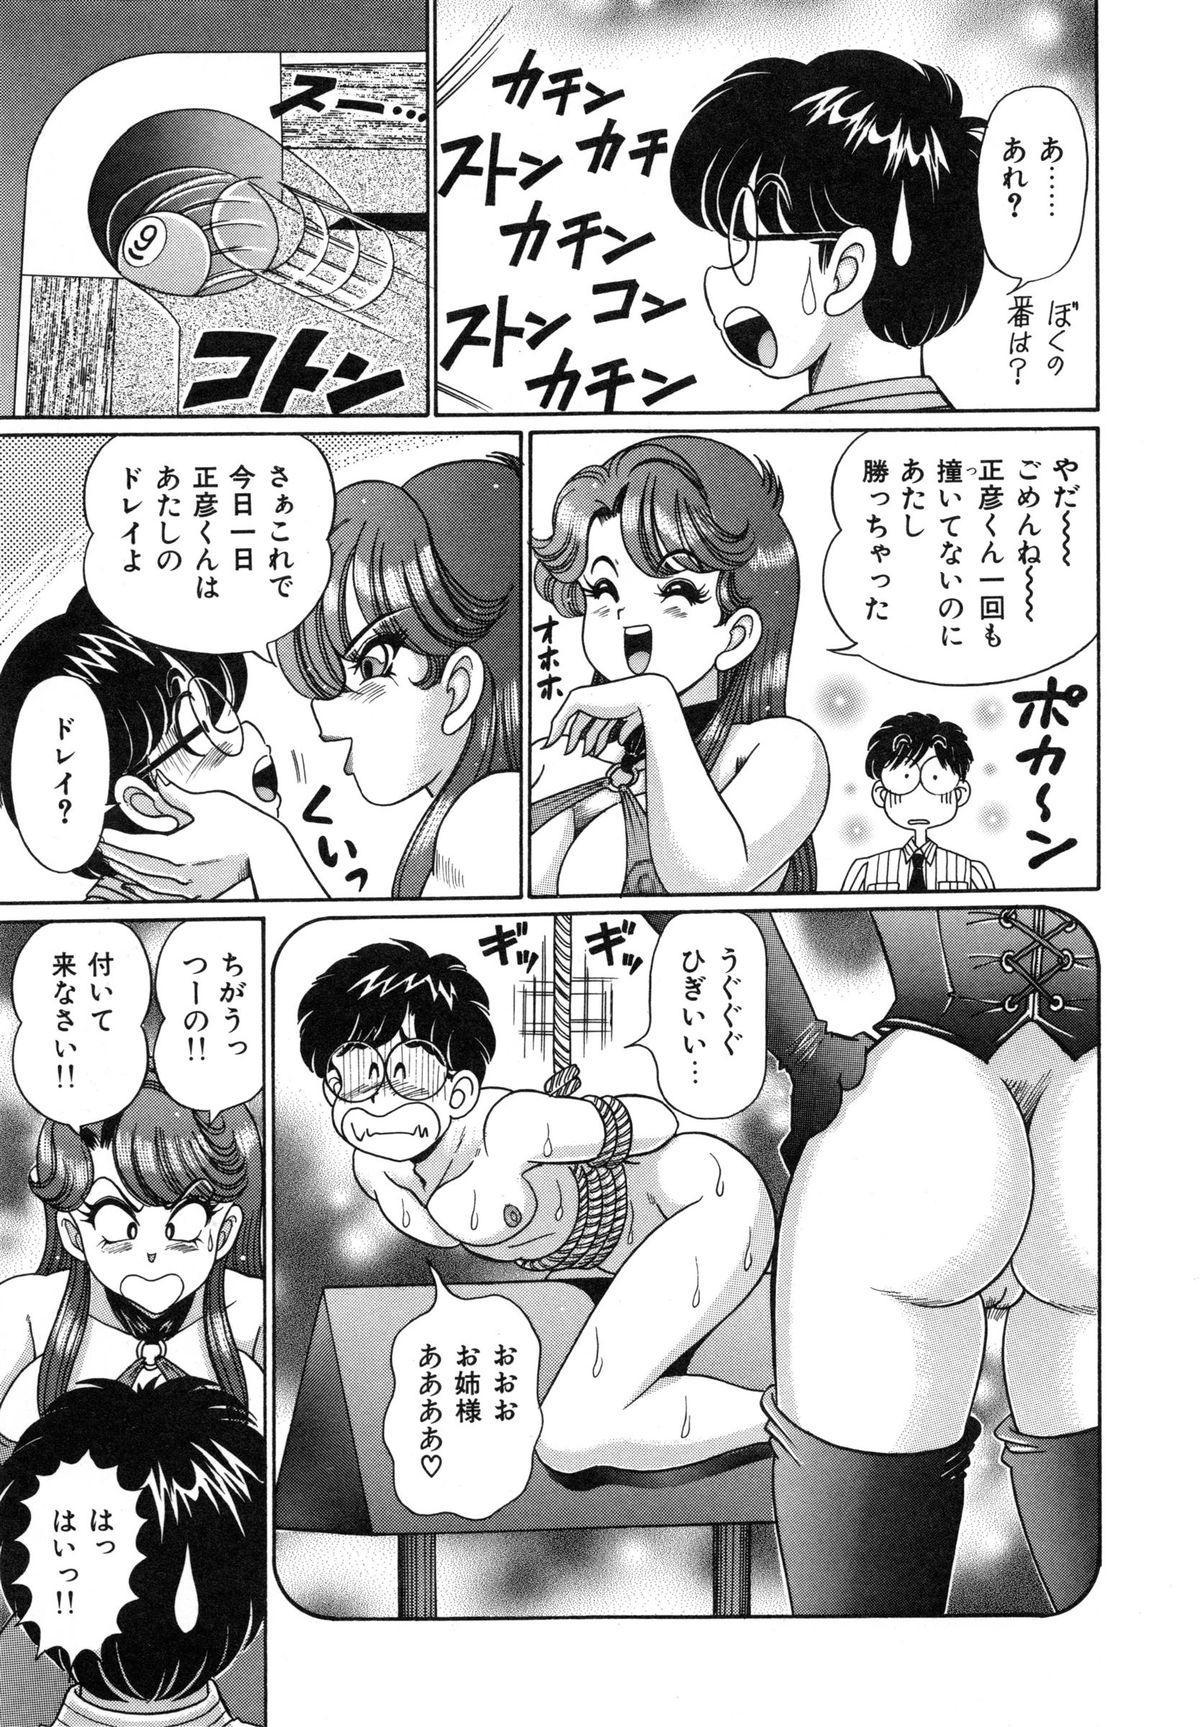 Anoko wa F-Cup 69